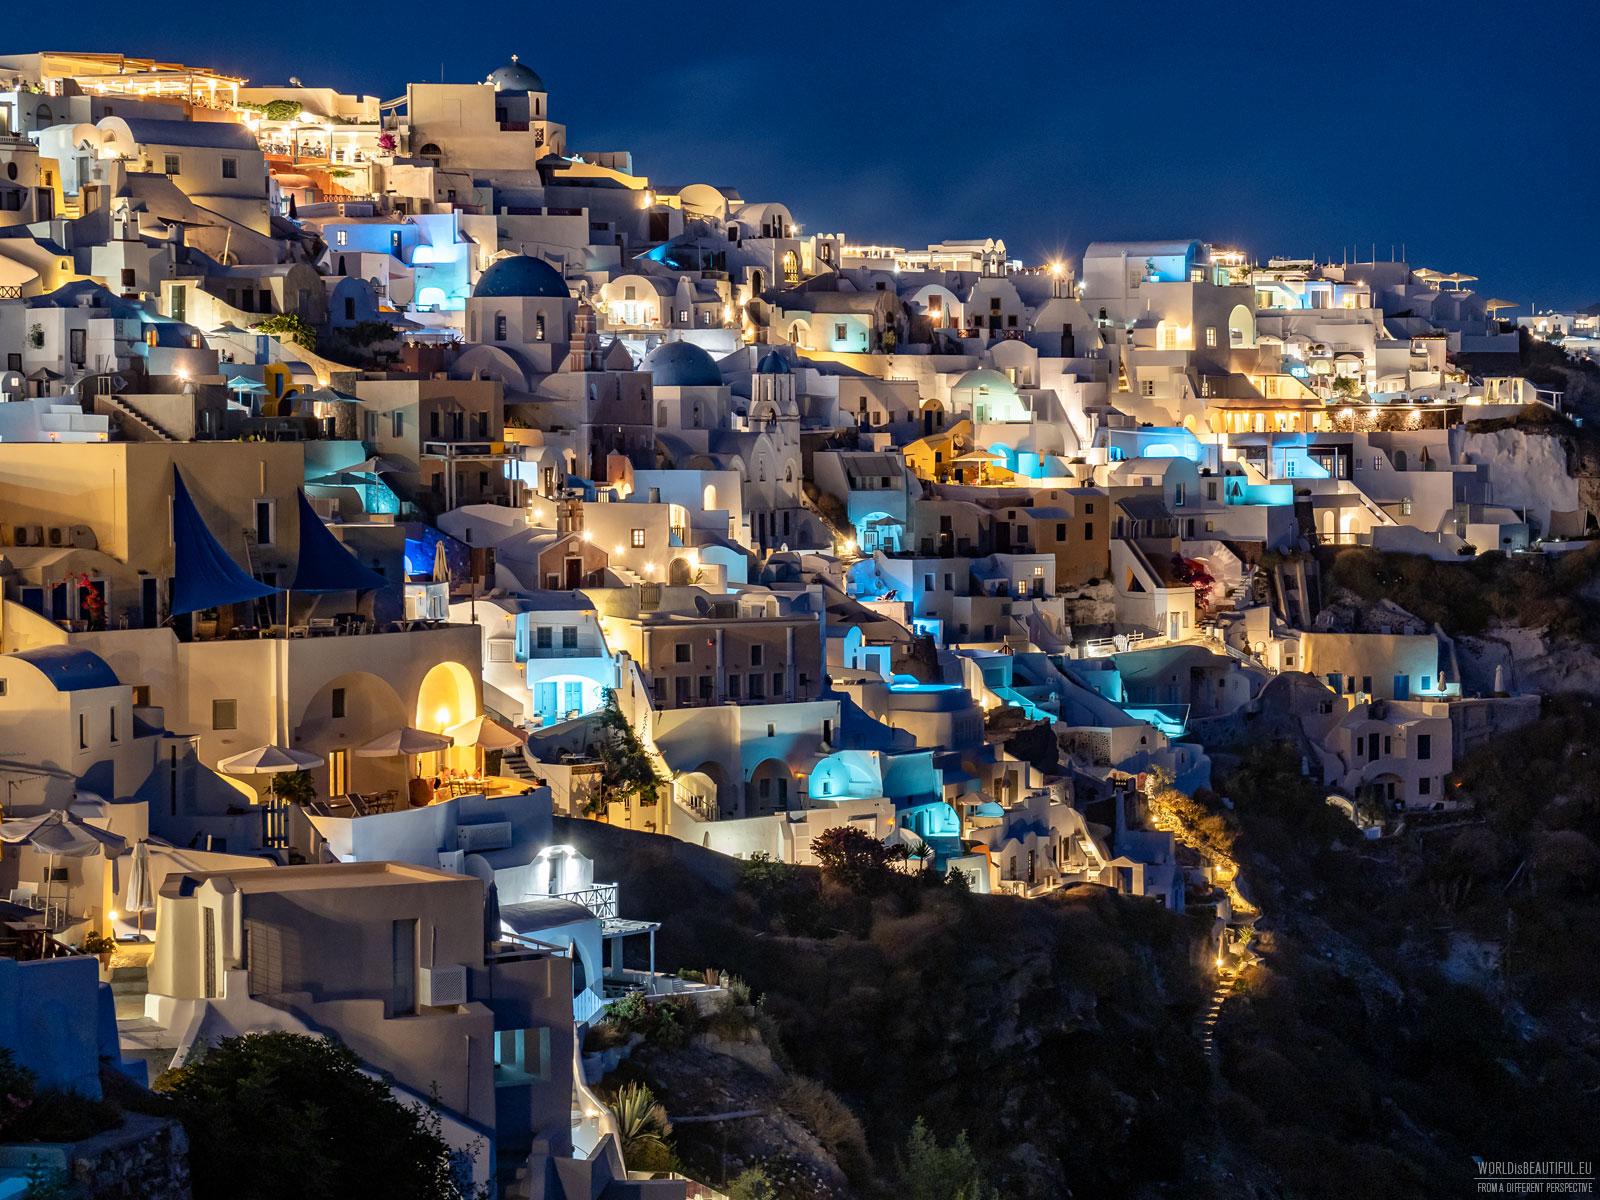 A night in Santorini